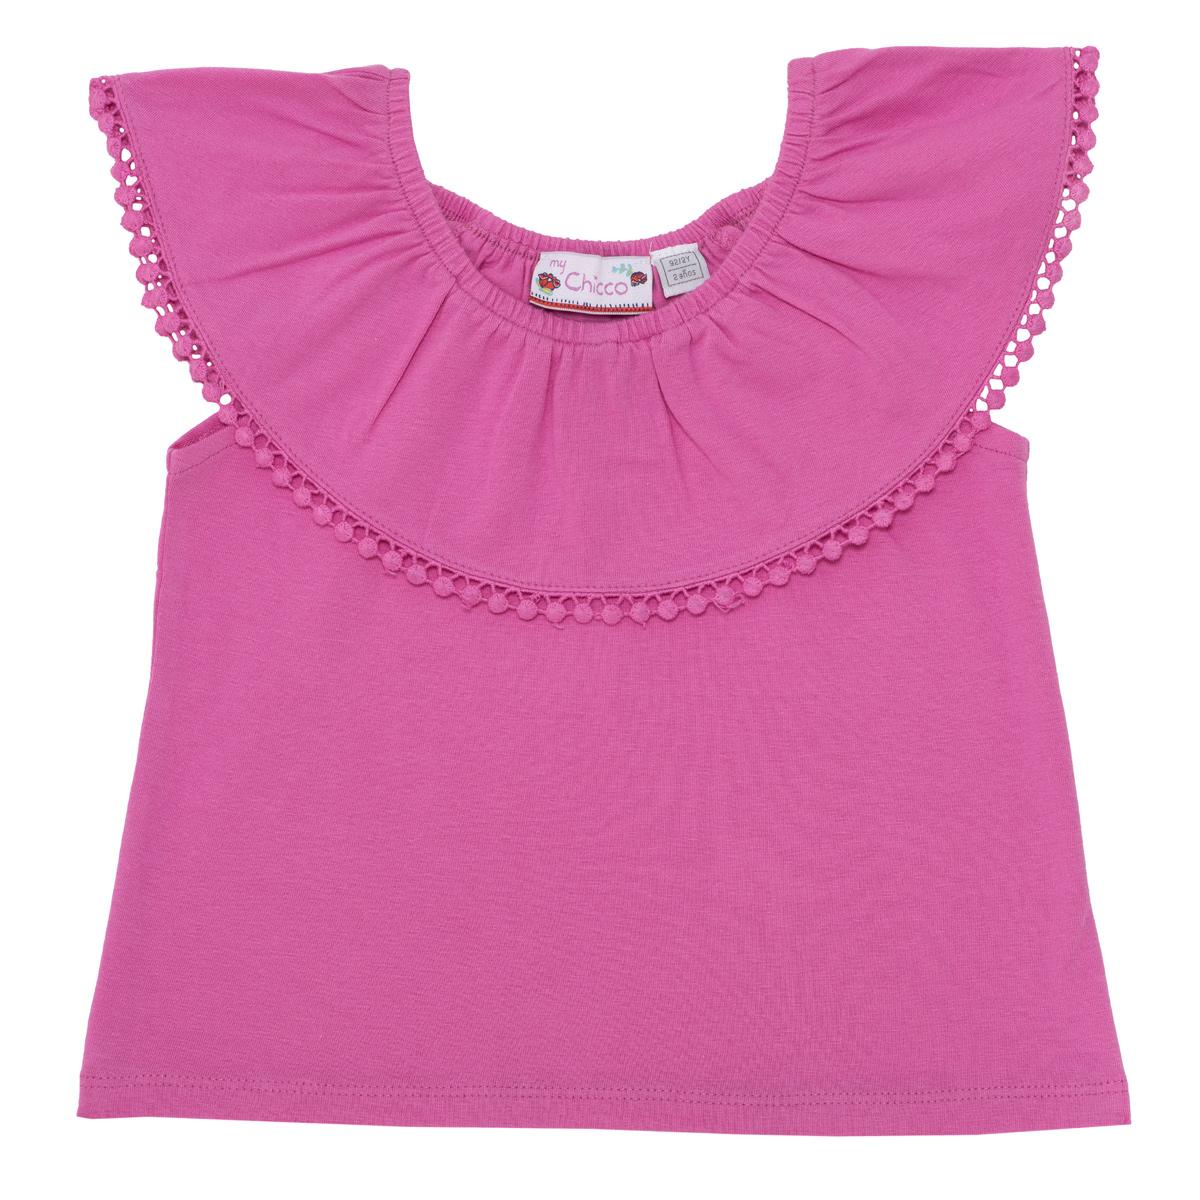 Tricou Fete Chicco, Maneca Scurta, Roz, 06021 imagine